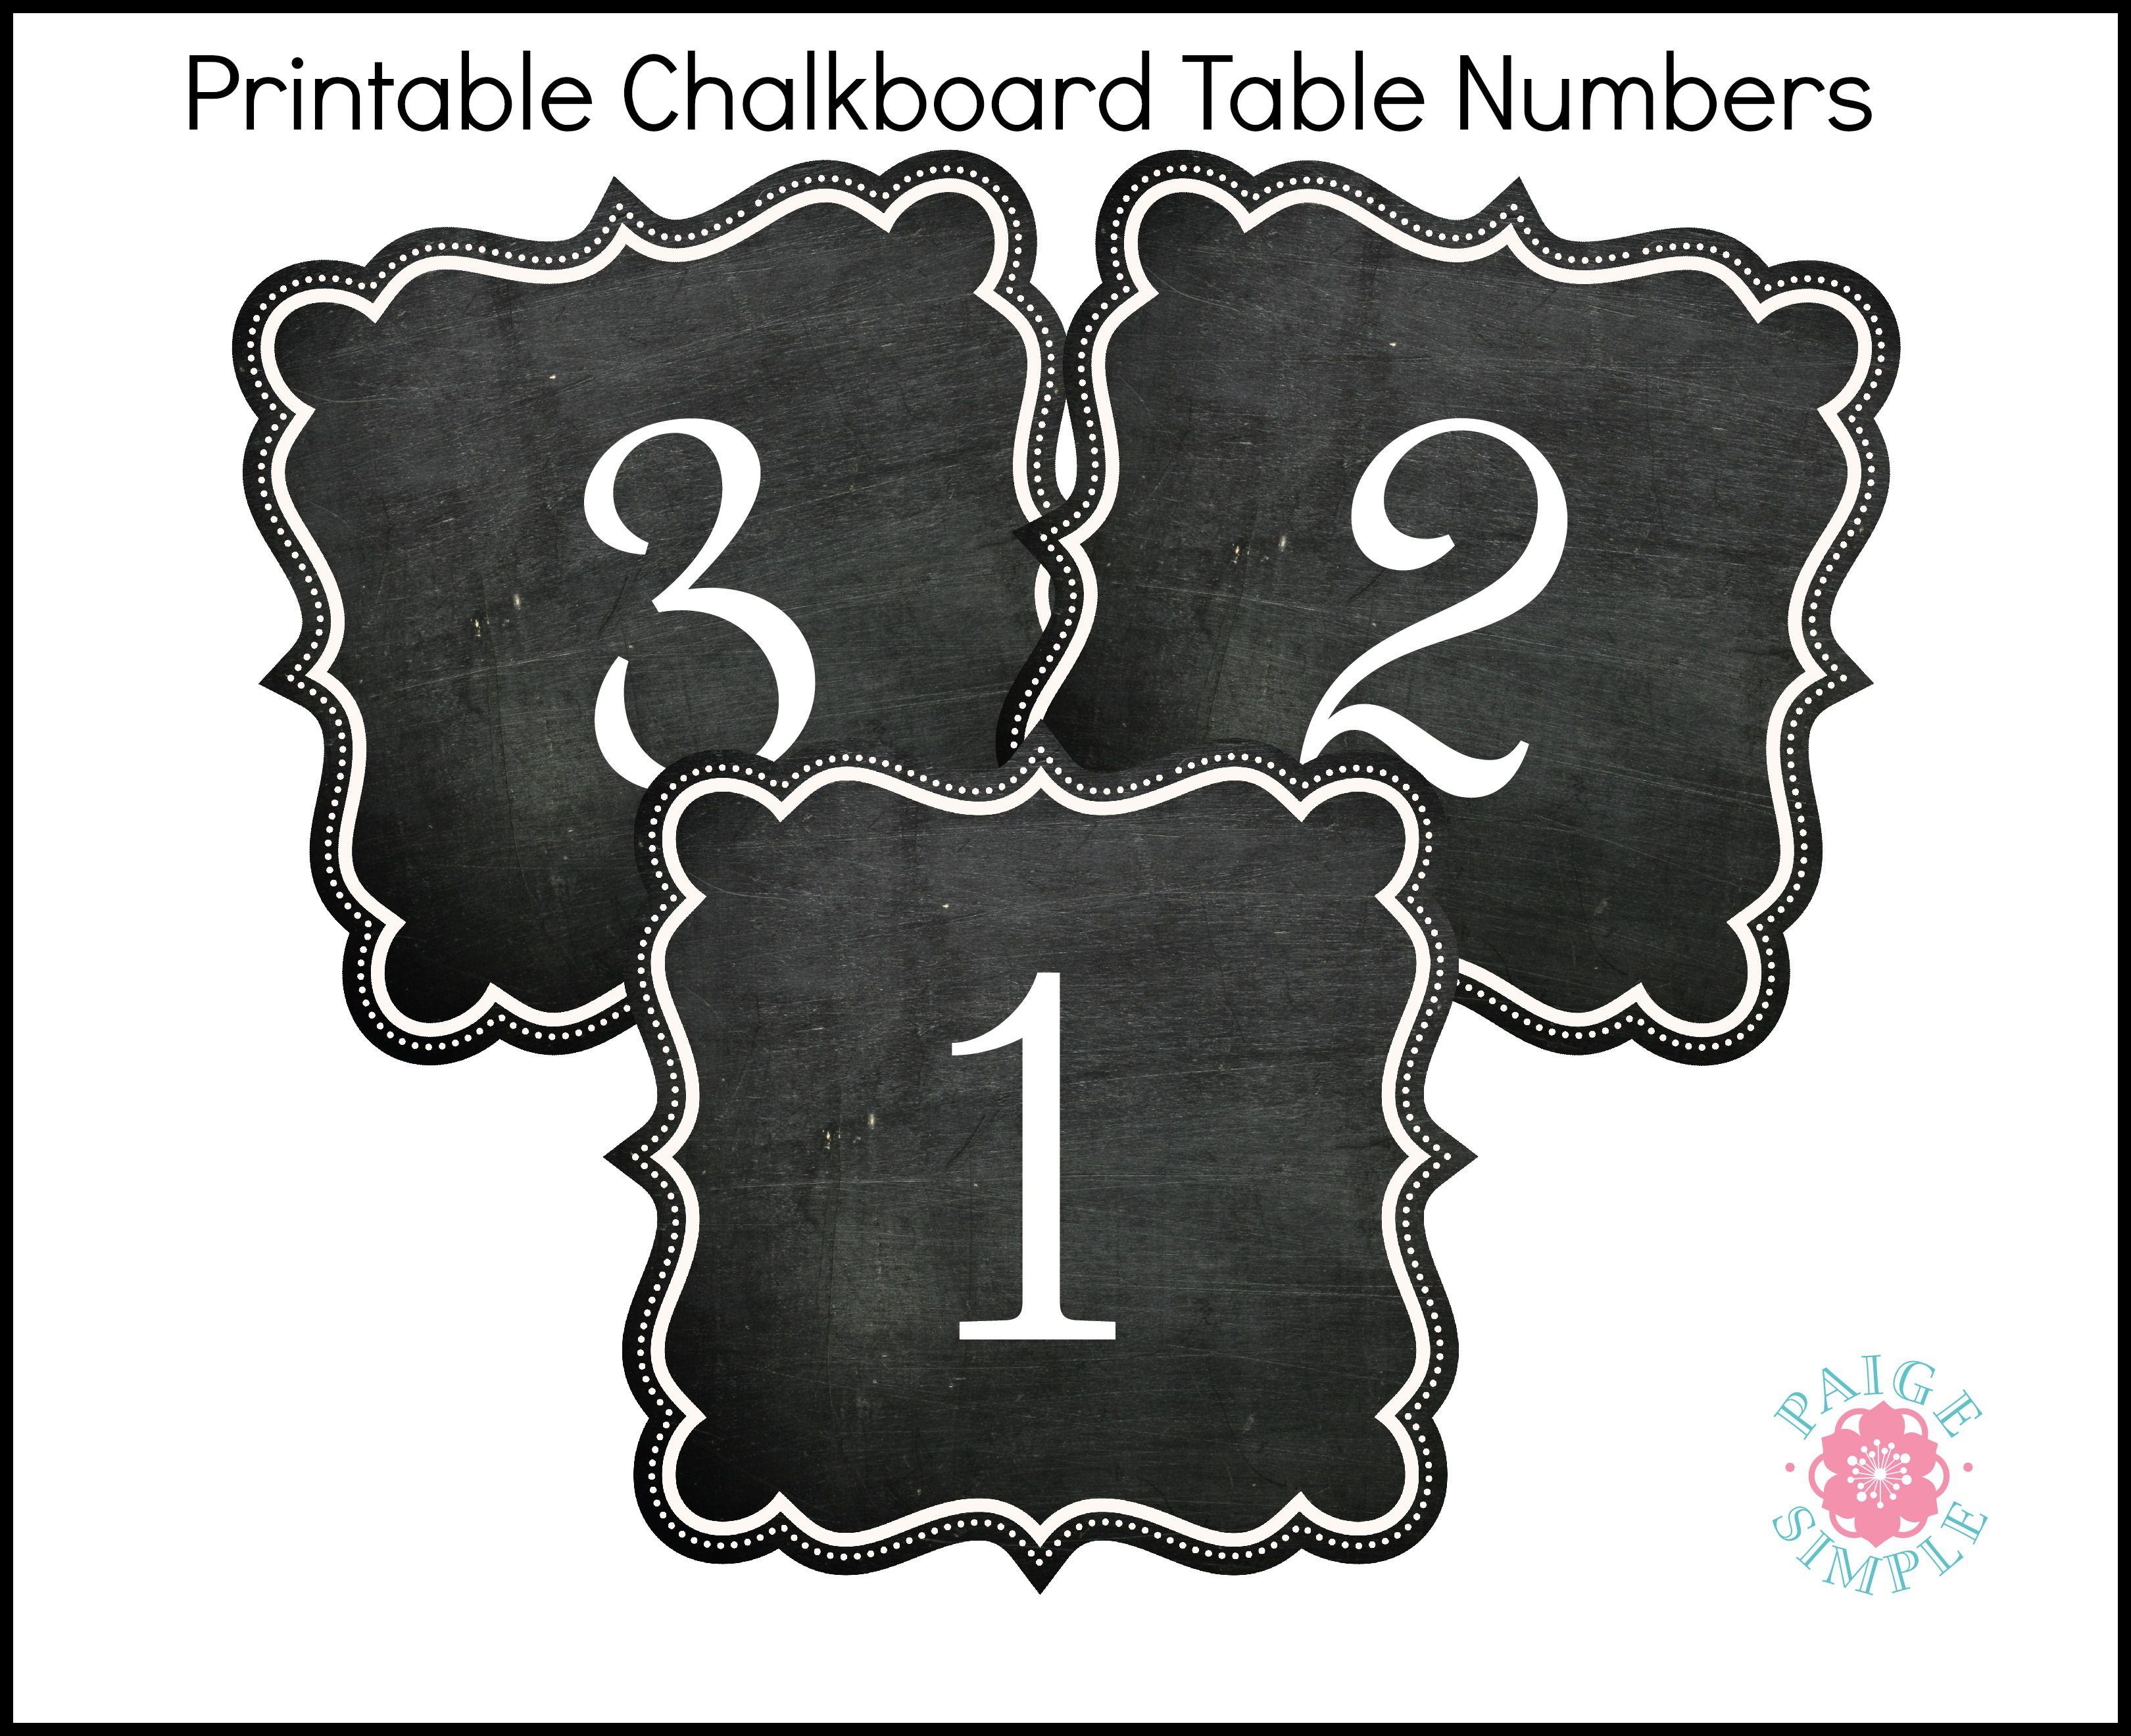 Chalkboard Table Numbers printables